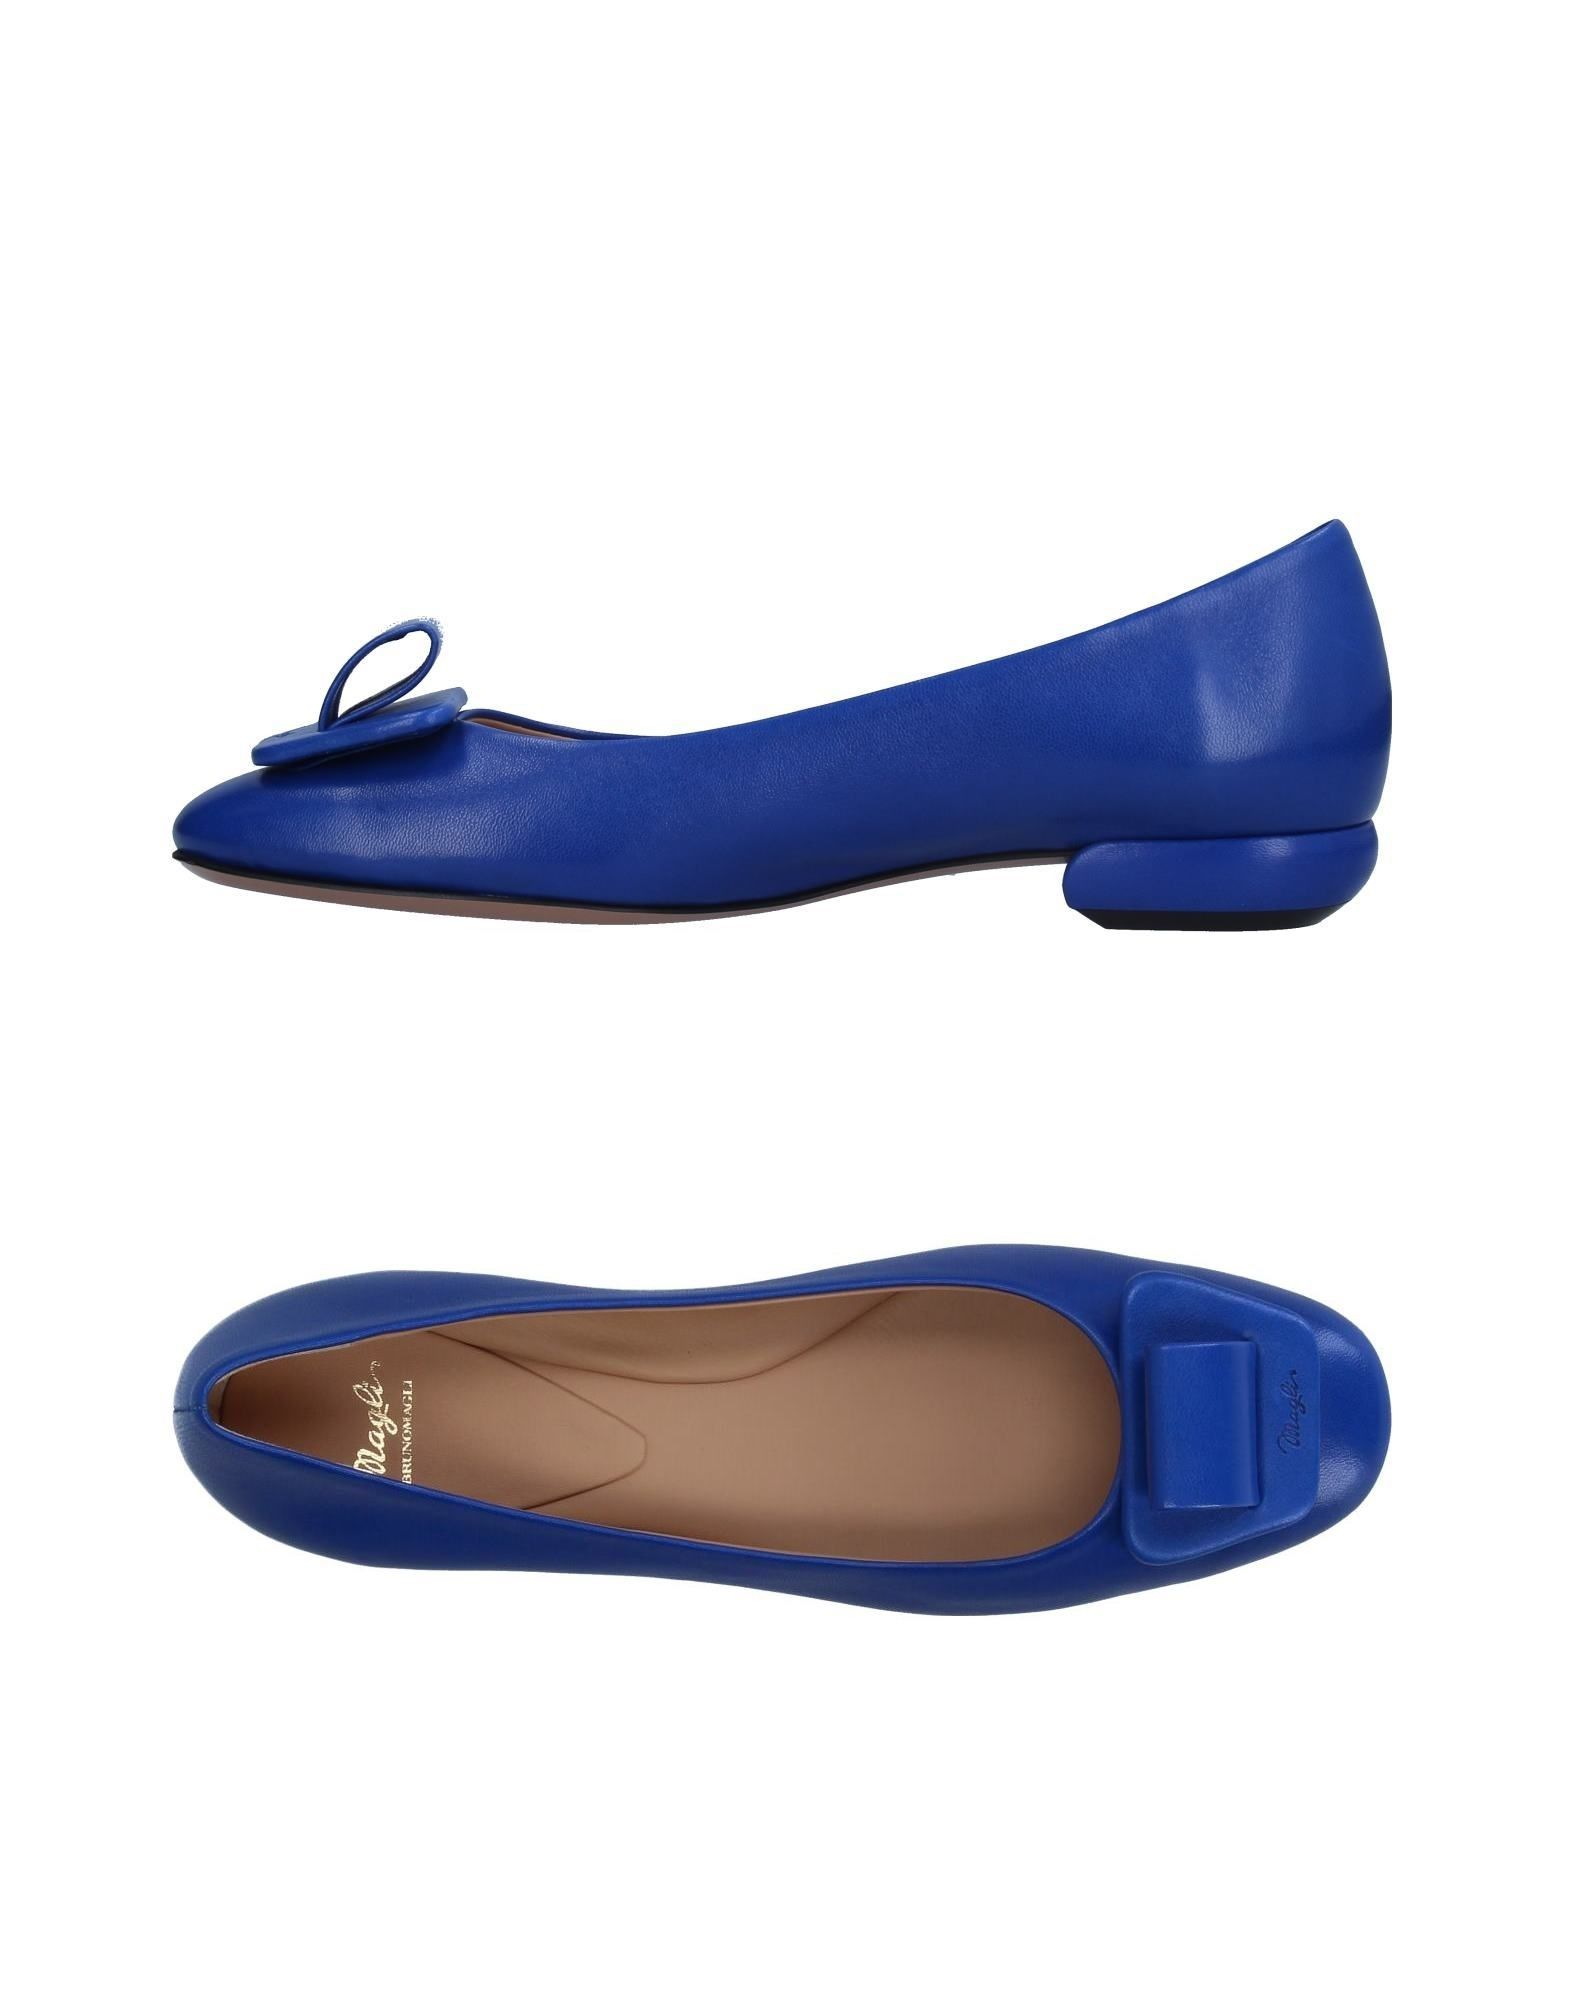 Magli By Bruno Magli aussehende Pumps Damen  11328100FOGut aussehende Magli strapazierfähige Schuhe 59ae59